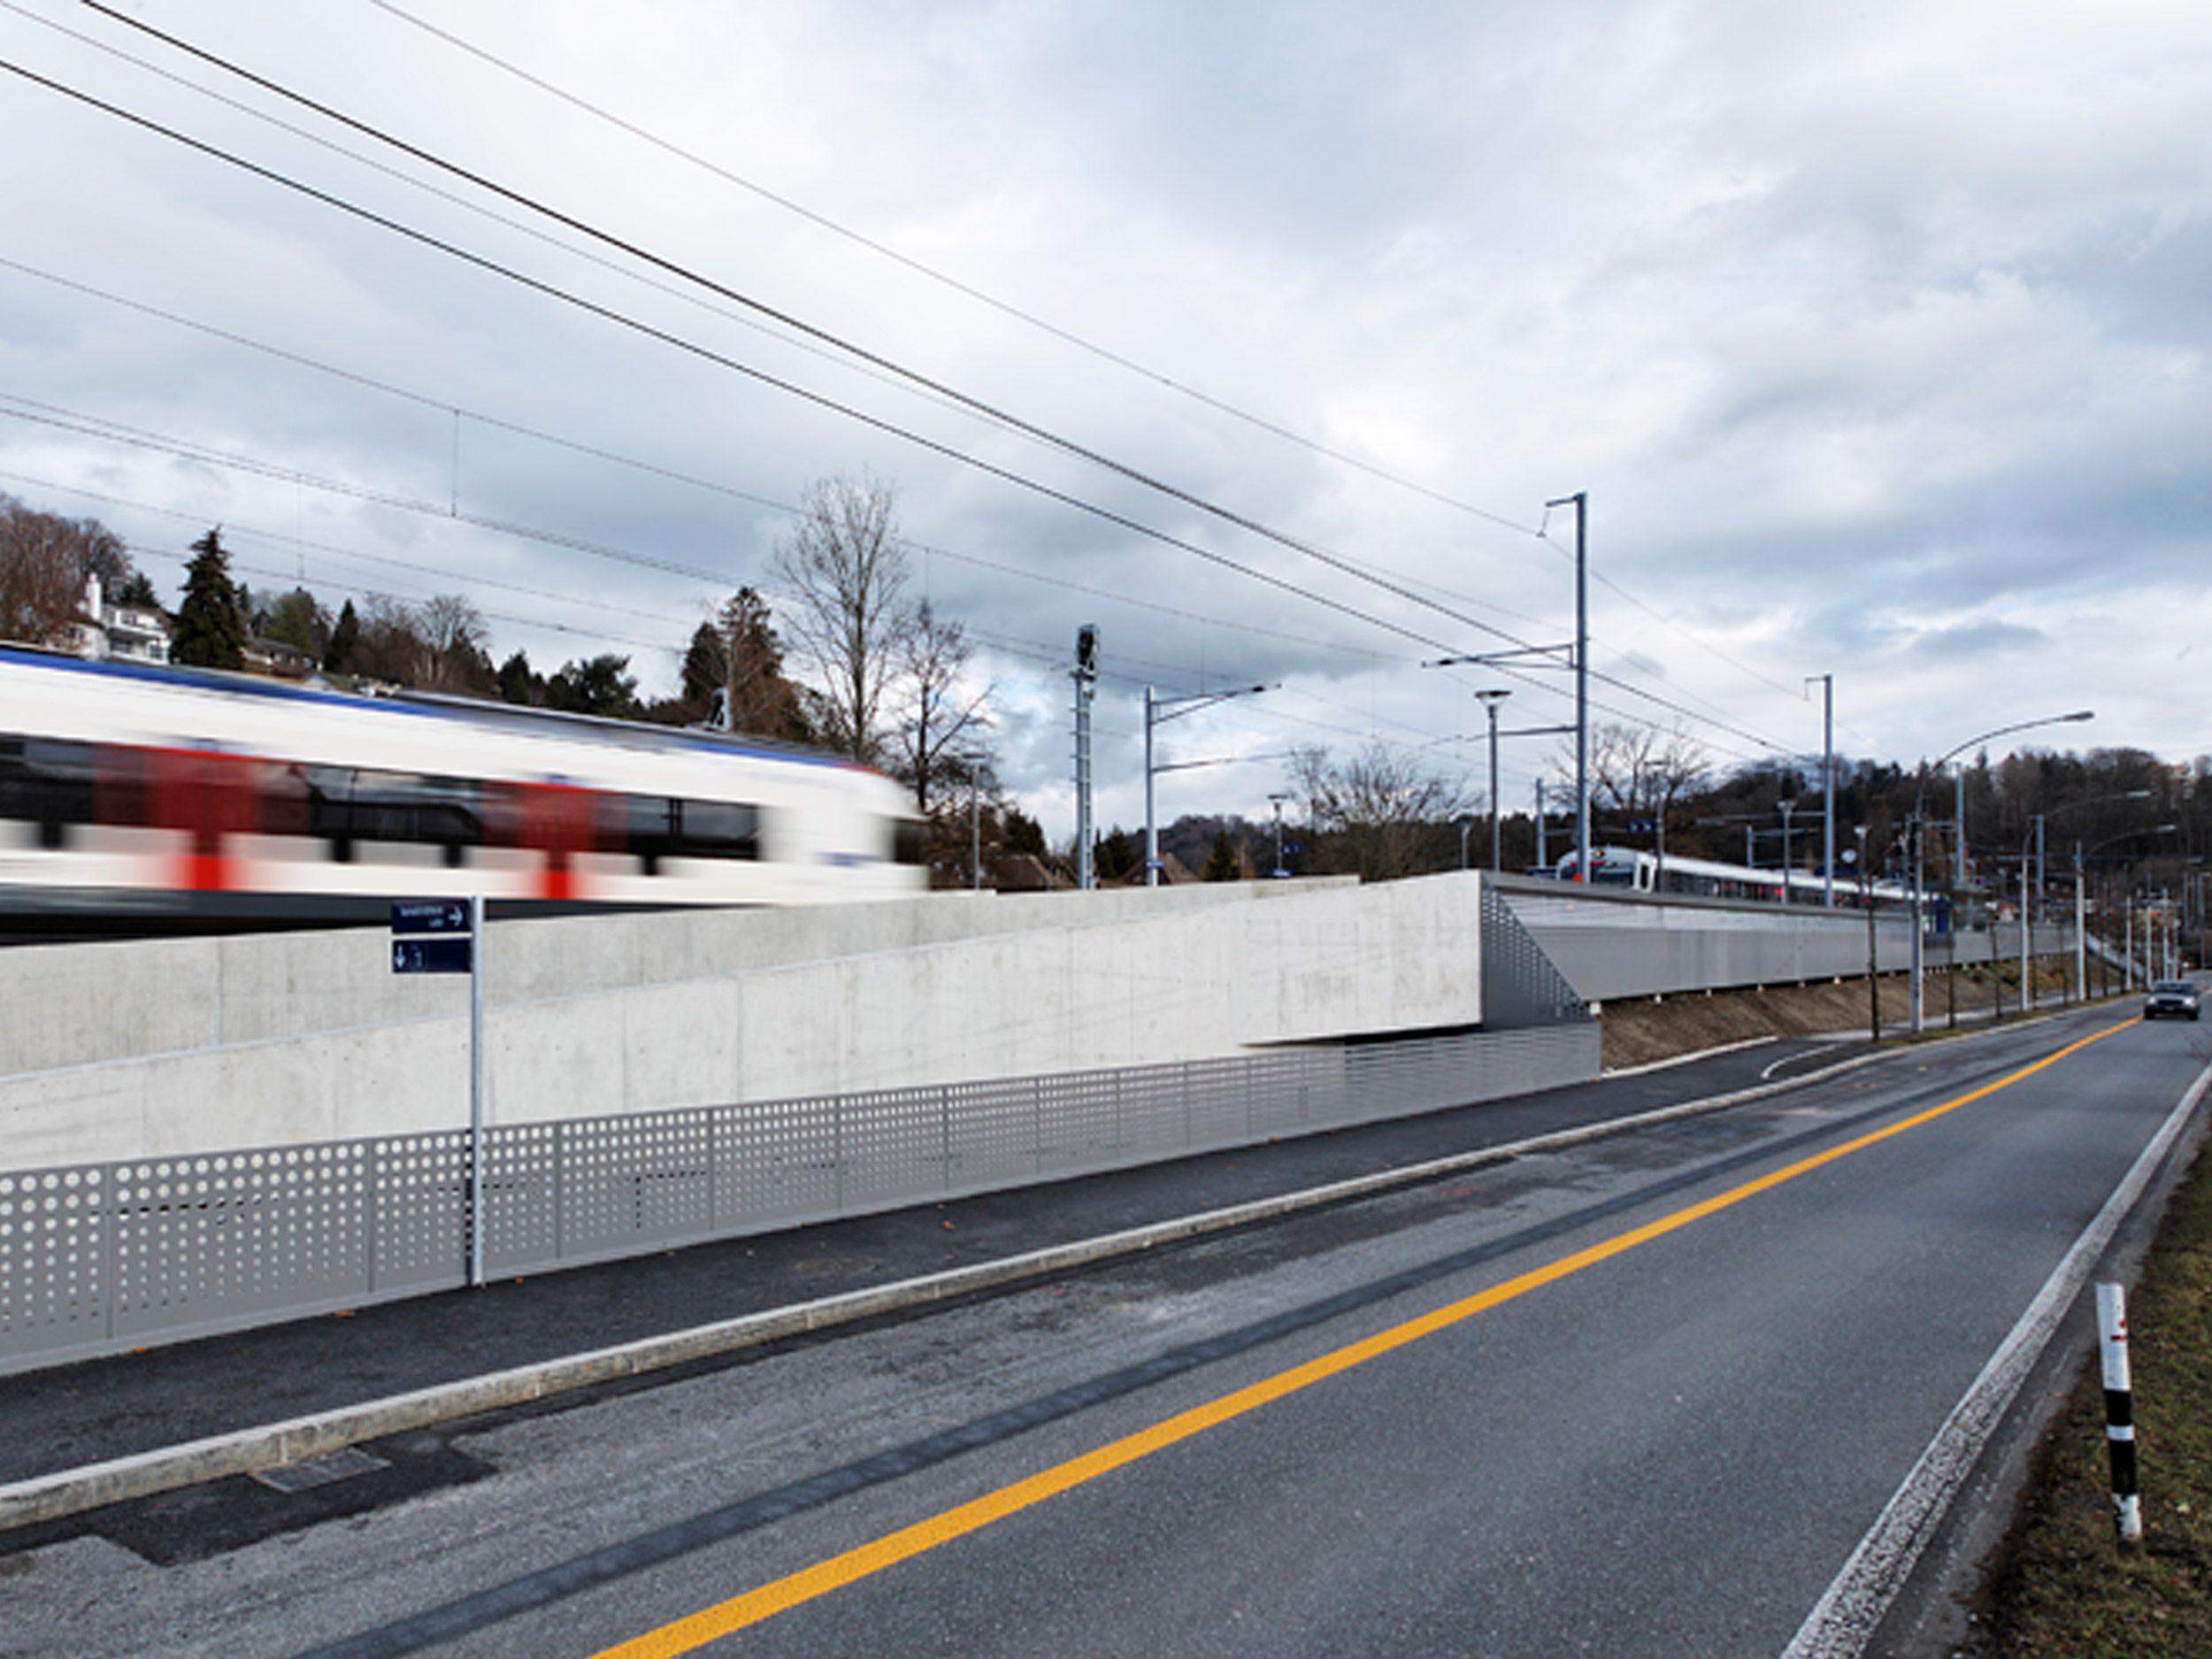 Bahnstation Luzern Verkehrshaus